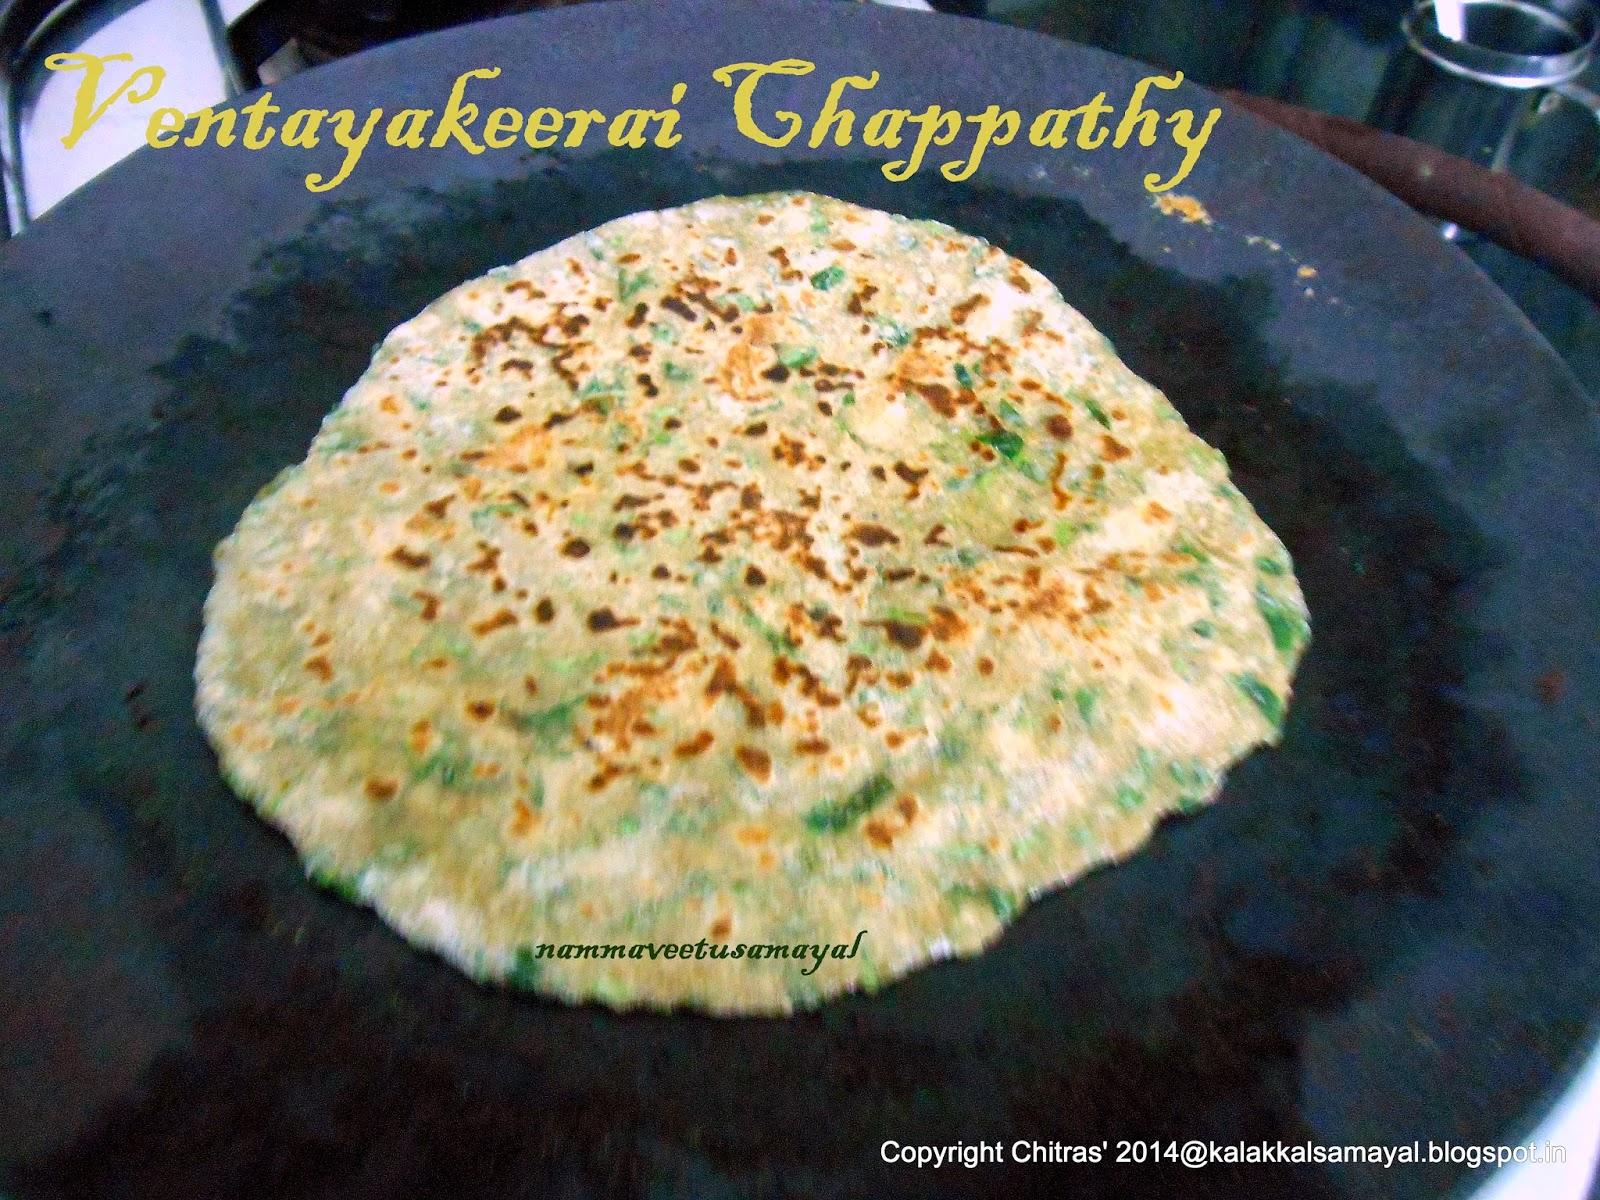 venthayakeerai chappathy